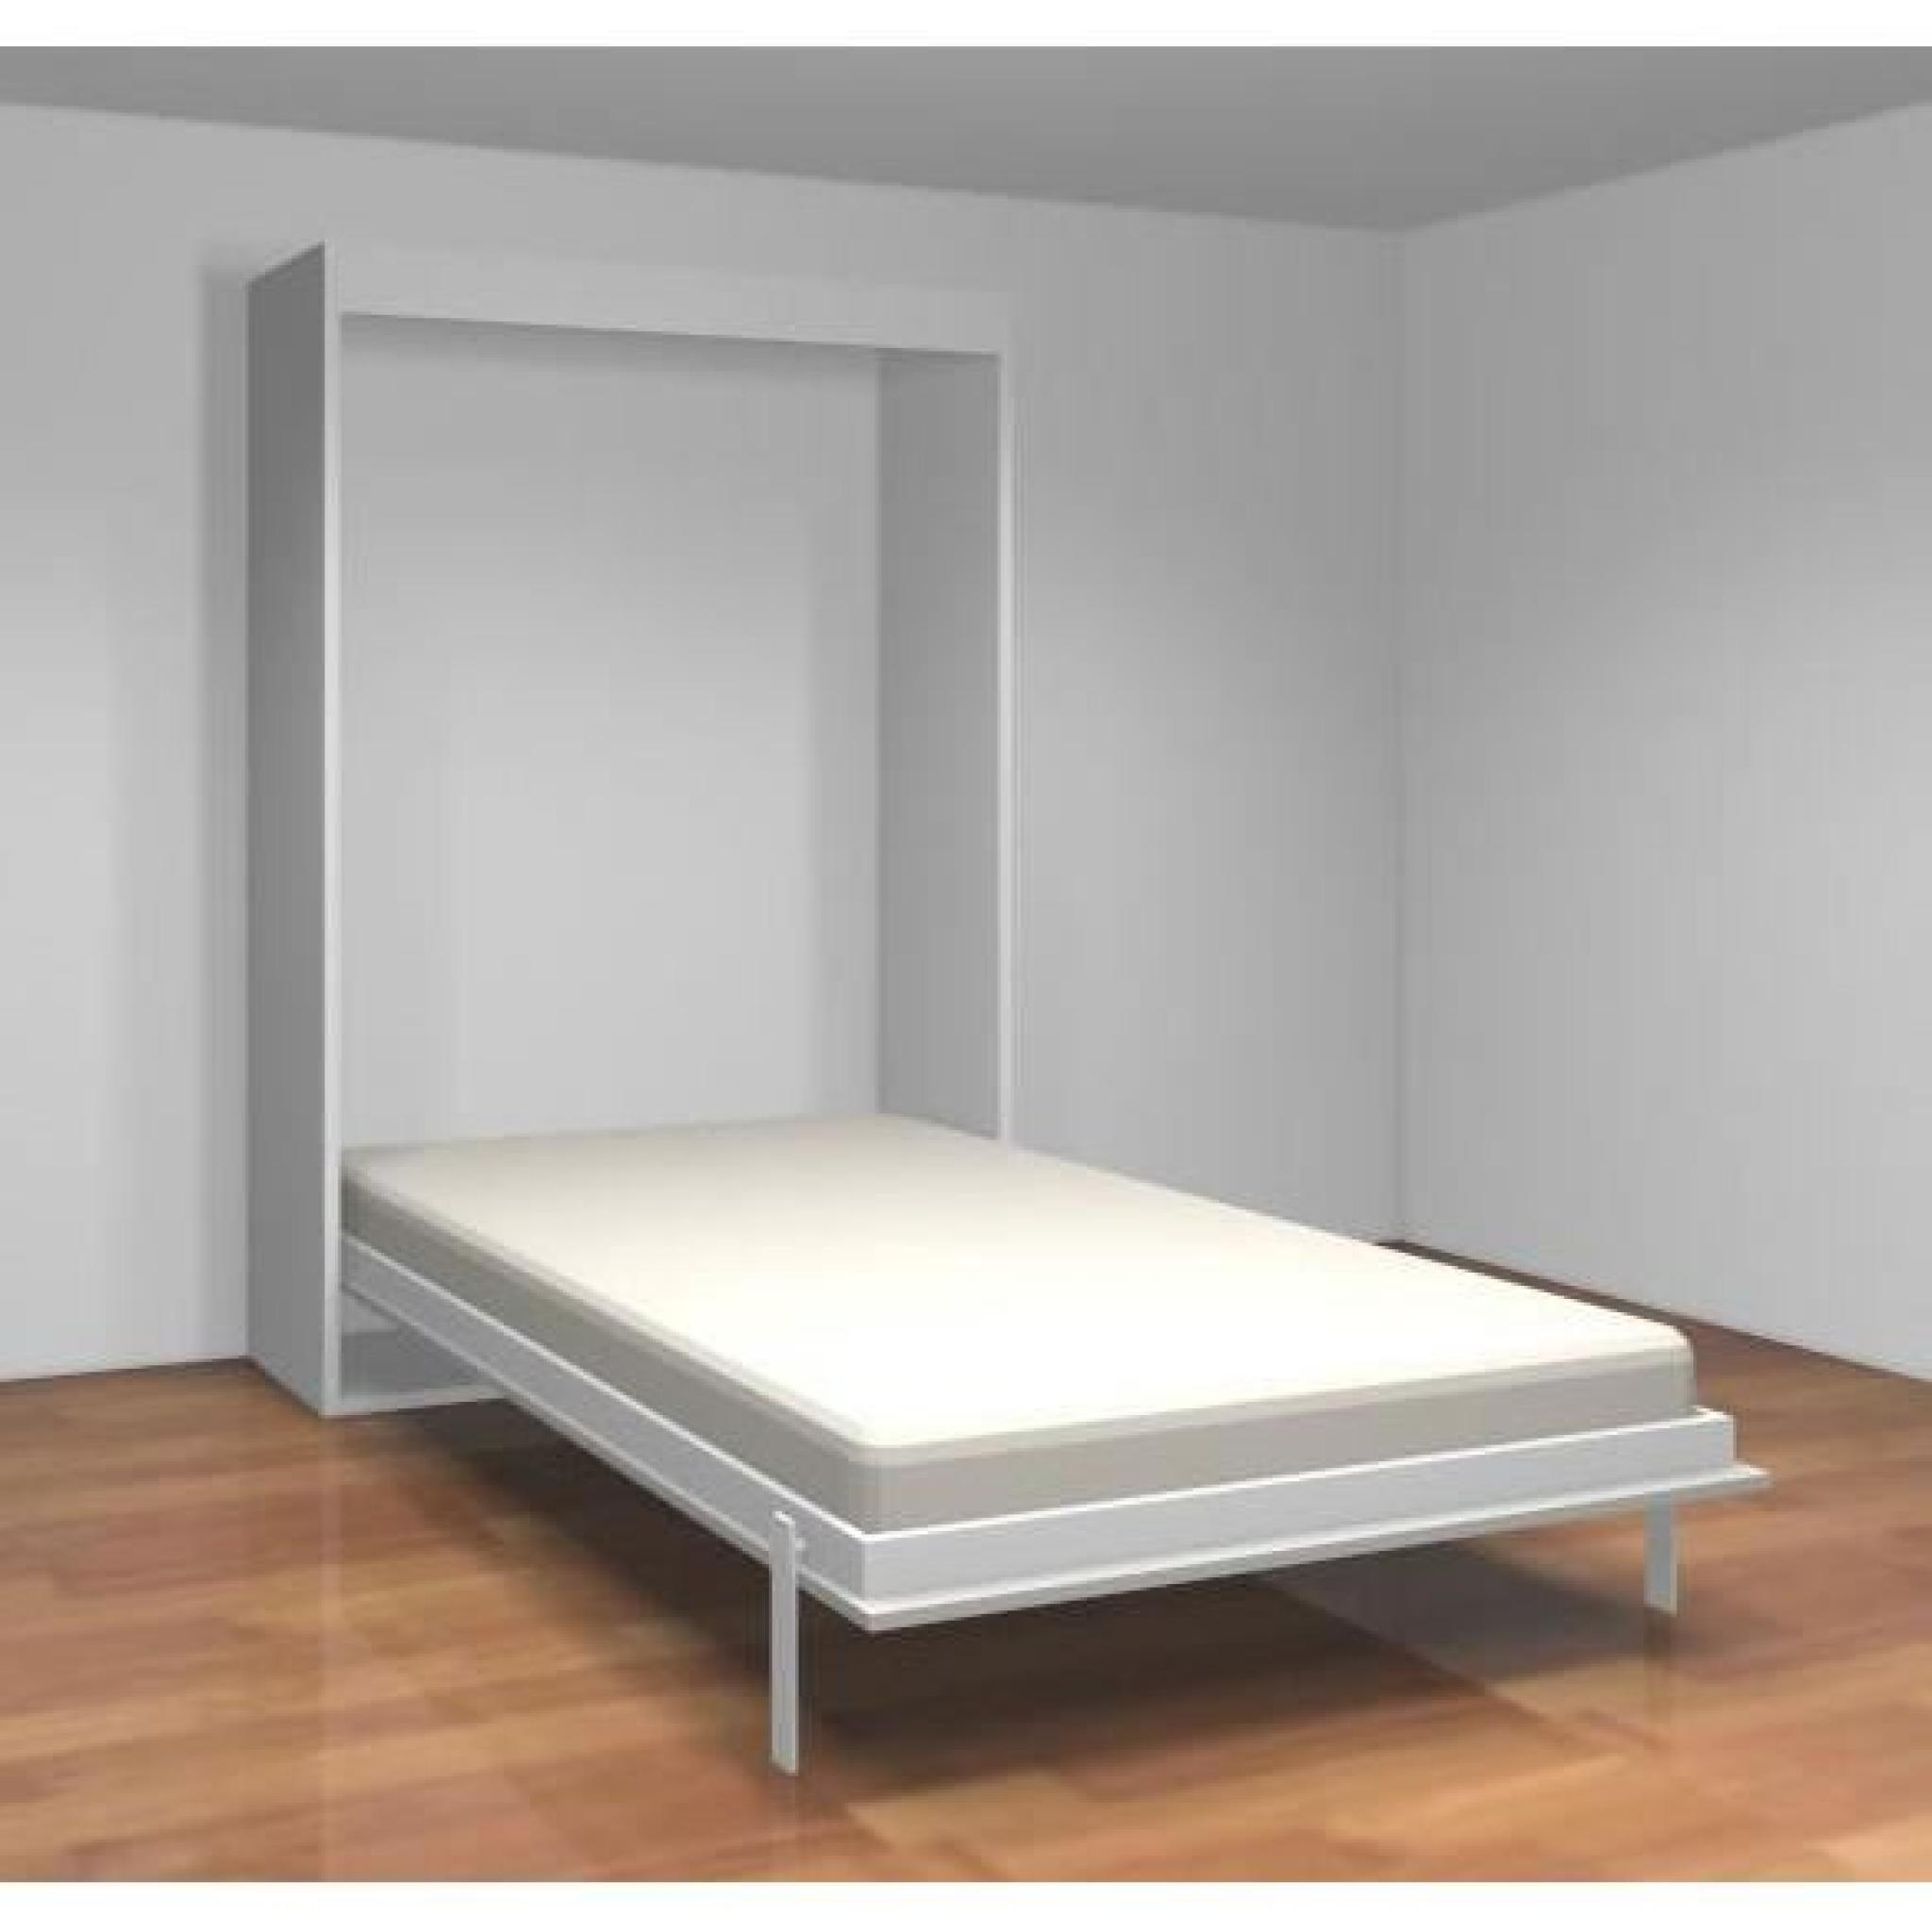 Armoire Lit Escamotable Pas Cher | Bright Shadow Online pour Lit Escamotable Plafond Pas Cher